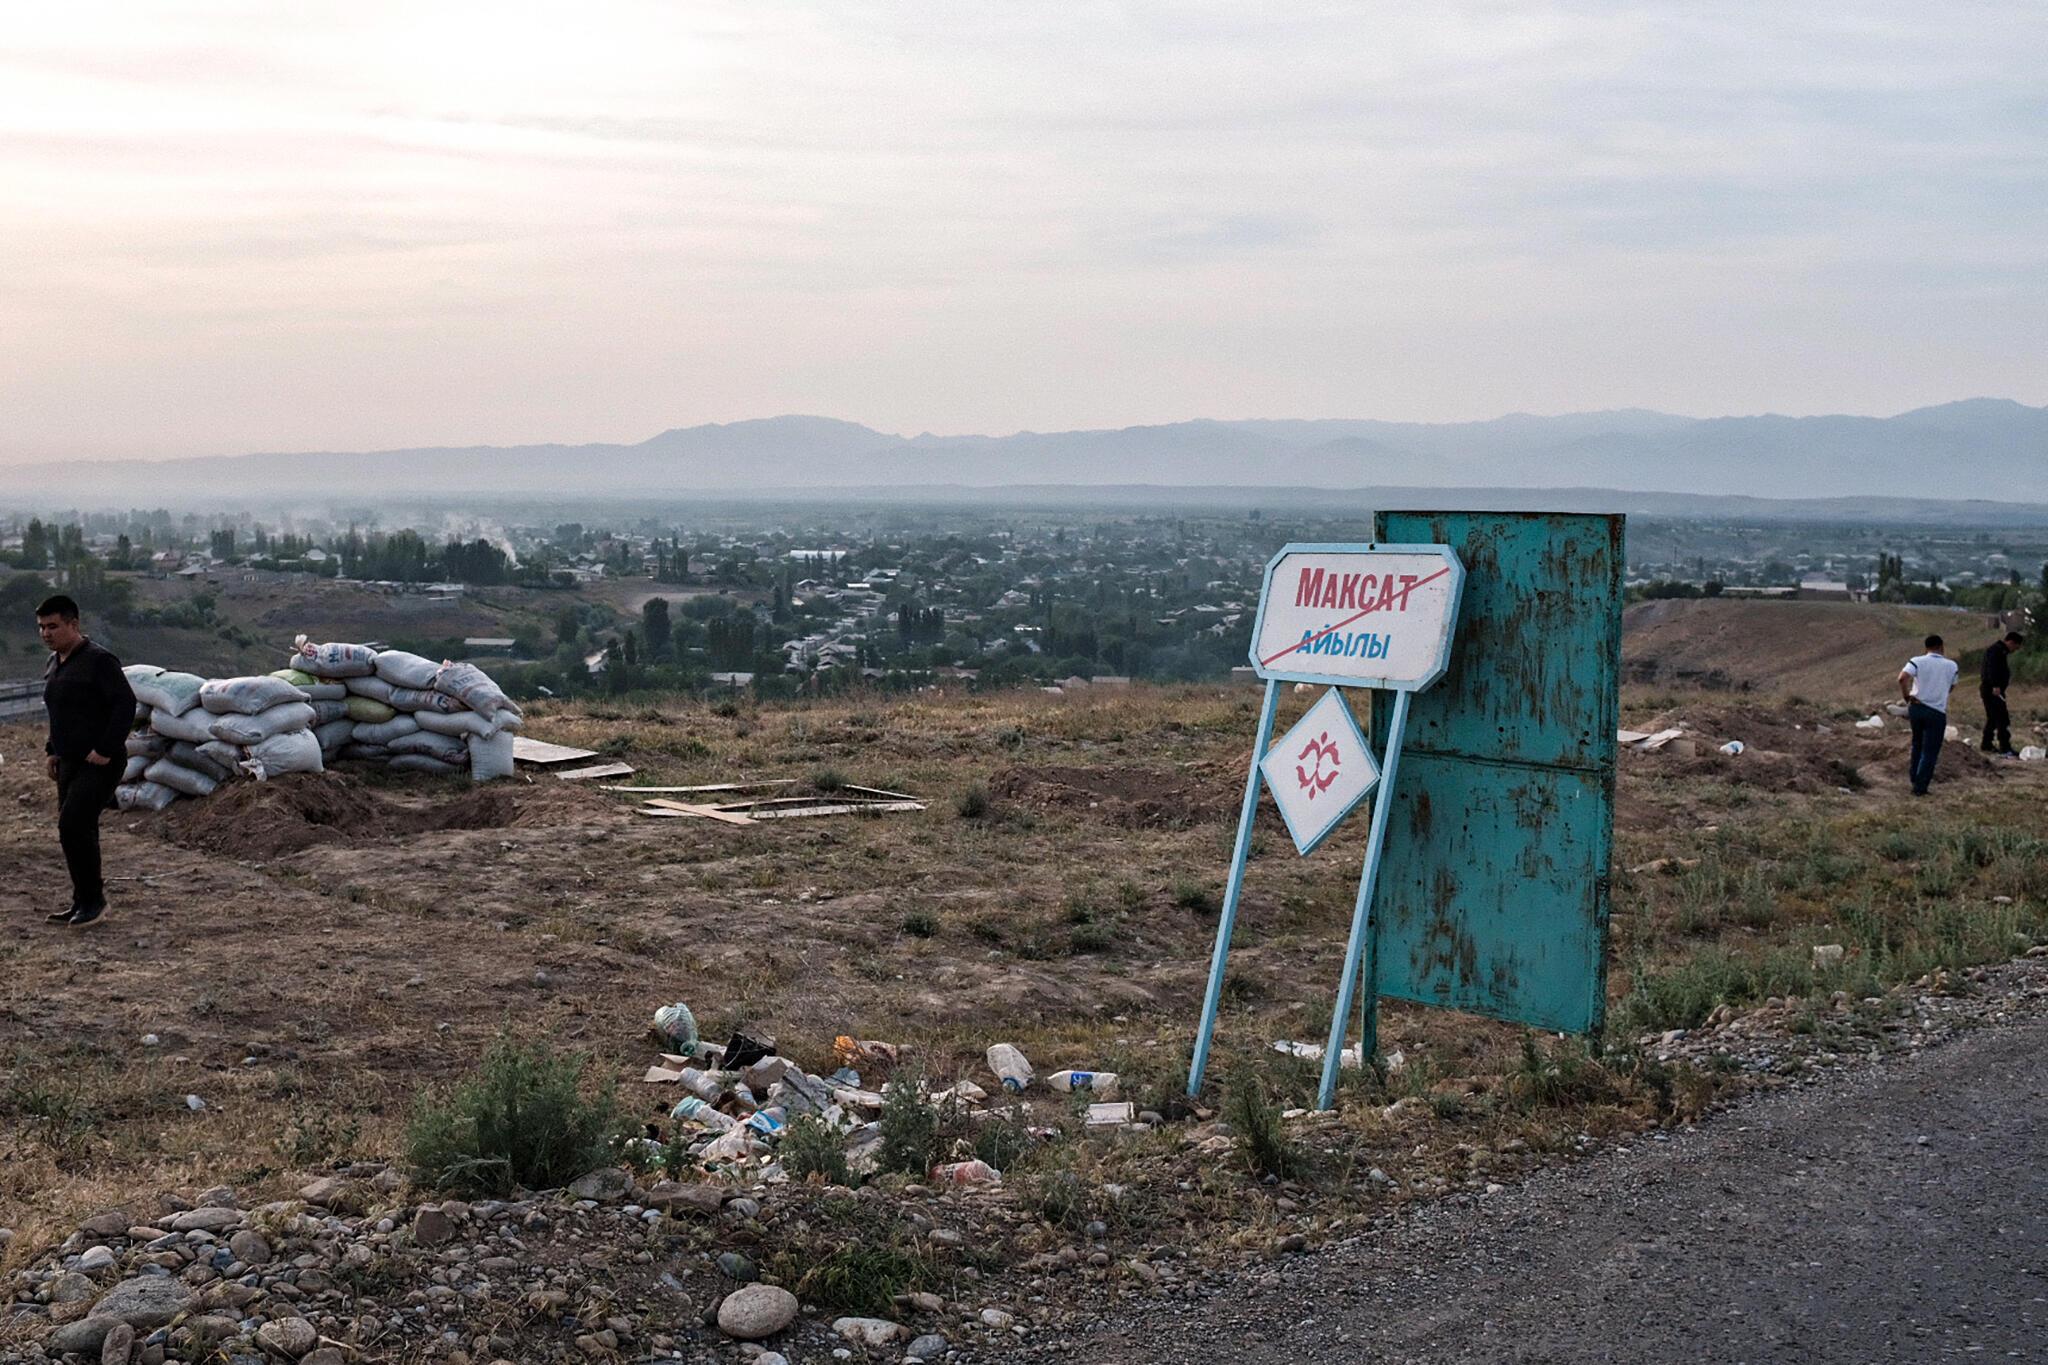 На границе кыргызского села Максат и таджиского джамоата Овчи Калача. Кыргызстан, 2 мая 2021 года.